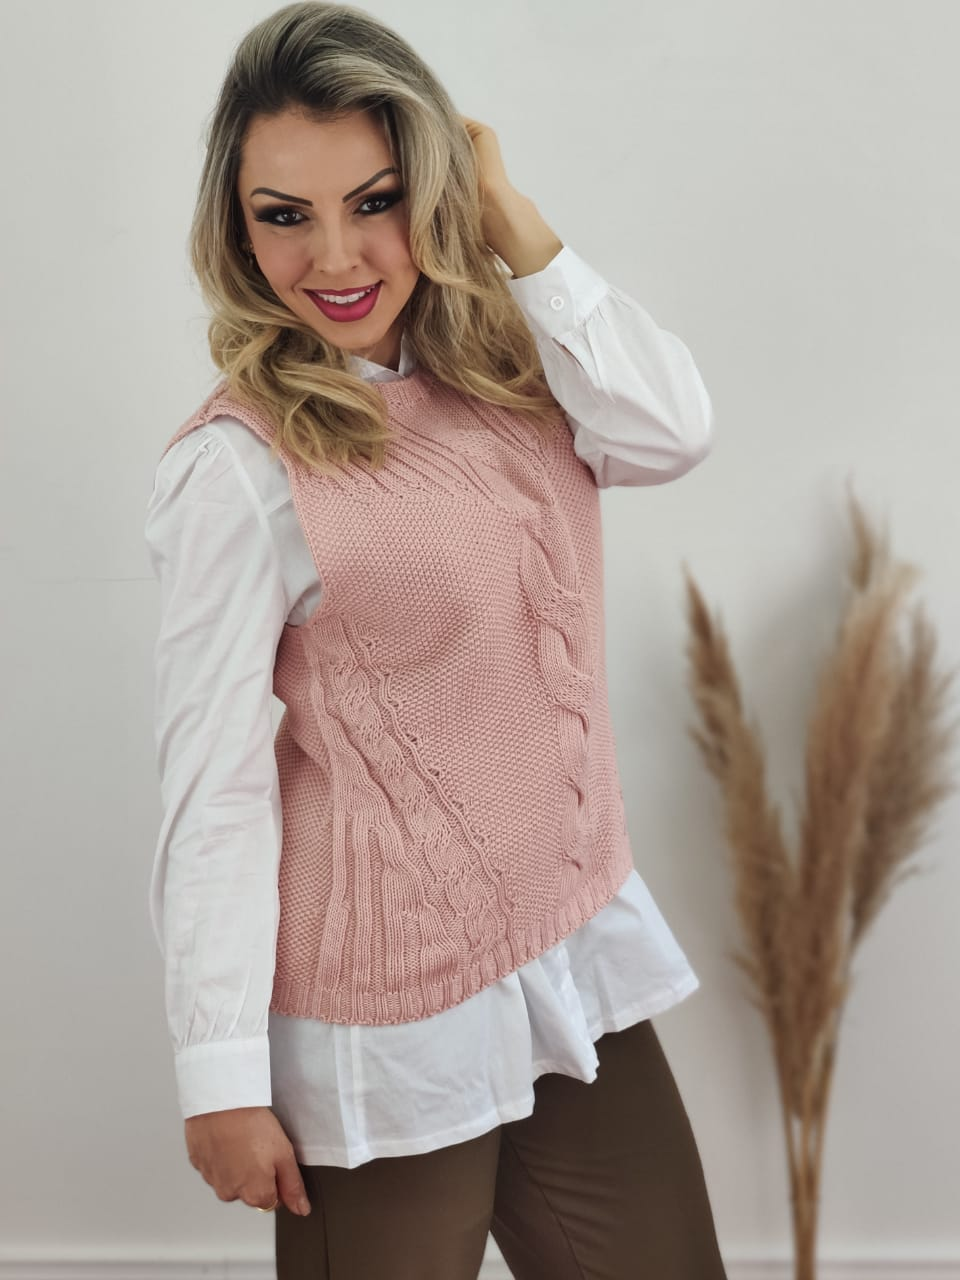 Look: 1 Colete Tricot Tranças Rosa + 1 Max Camisa Manga Longa Detalhe Bolso Branca